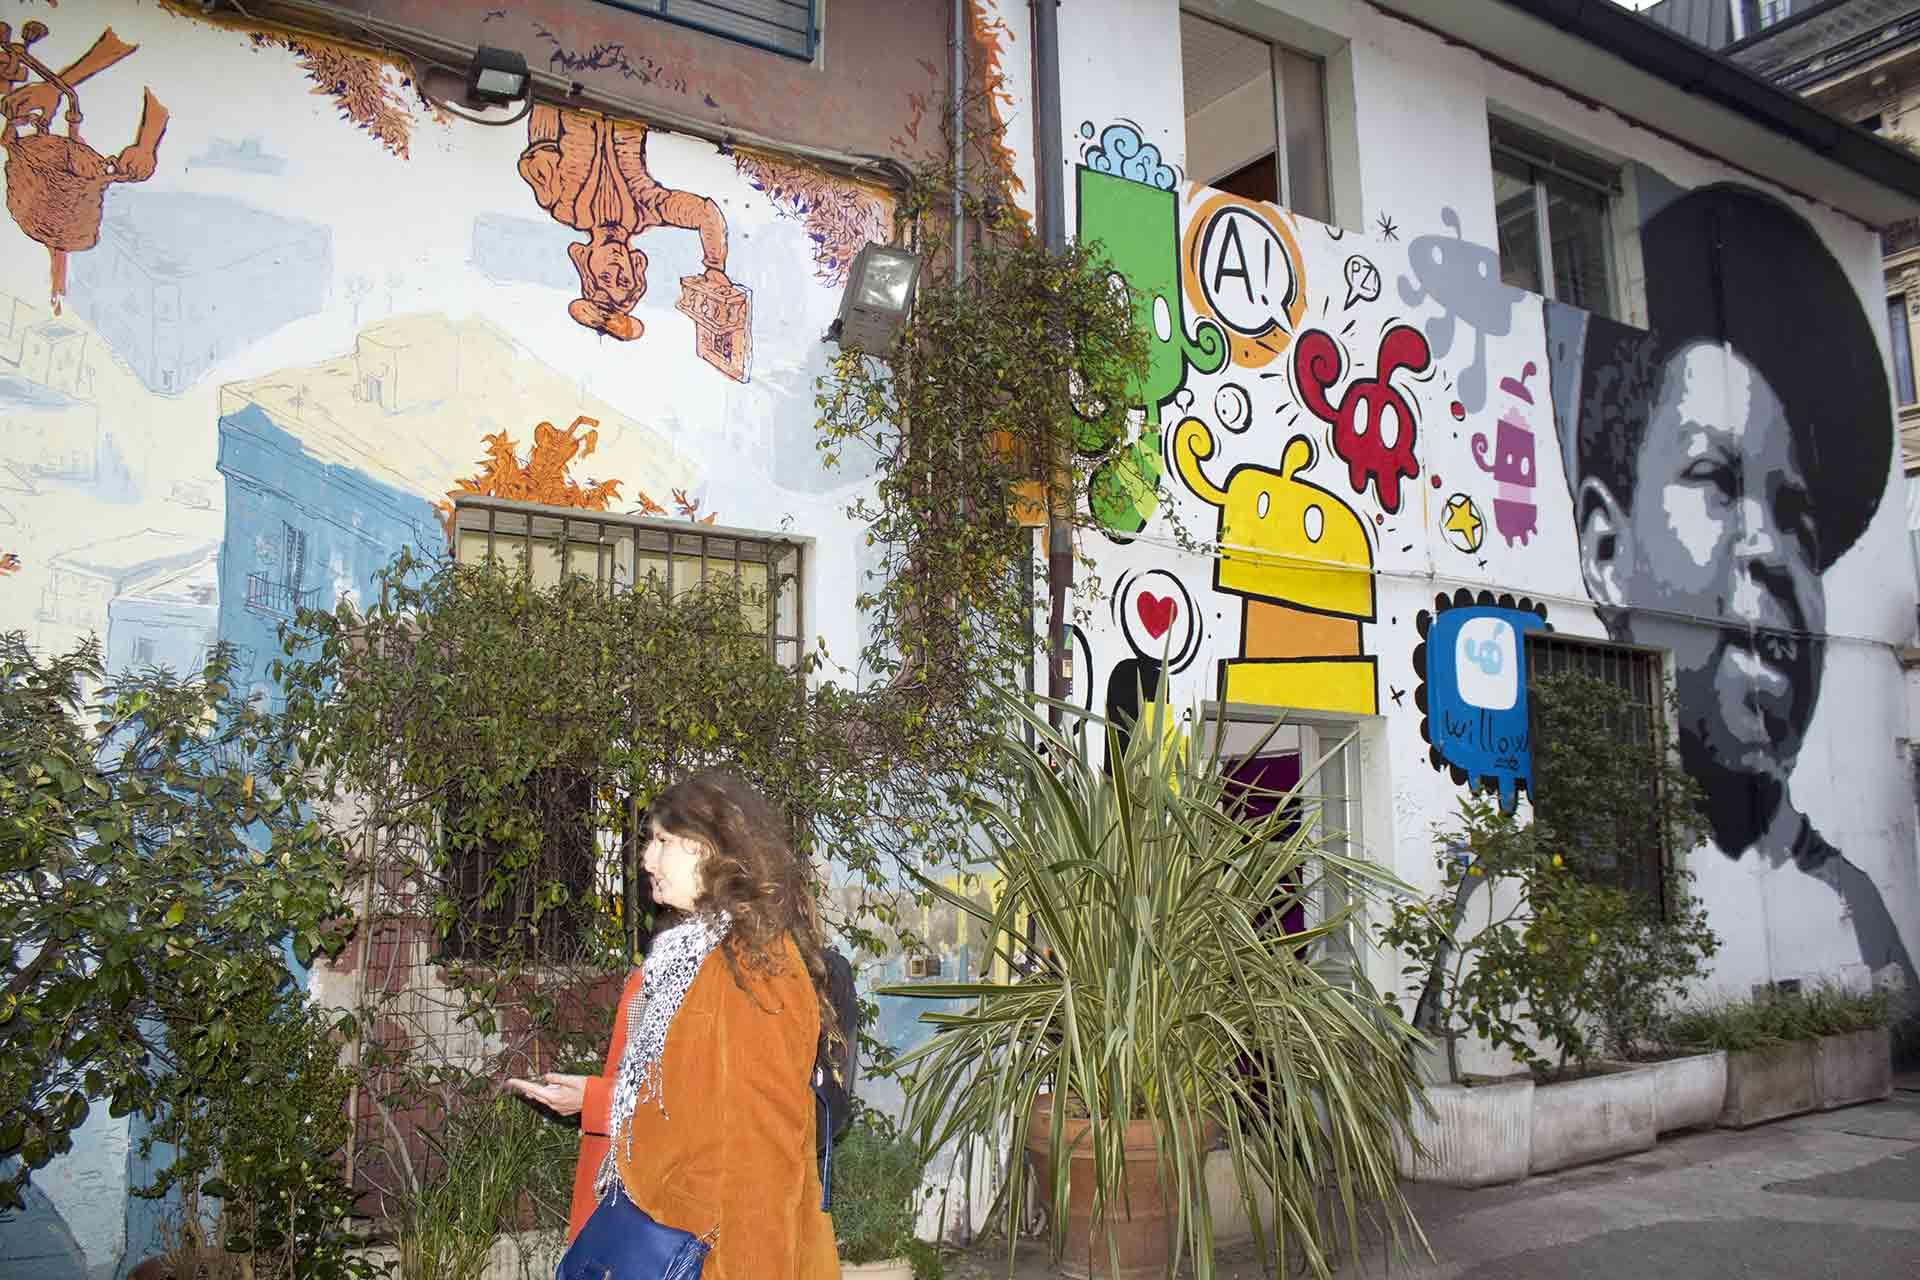 A Milano Isola Tra Vintage, Street Art E Tatoo